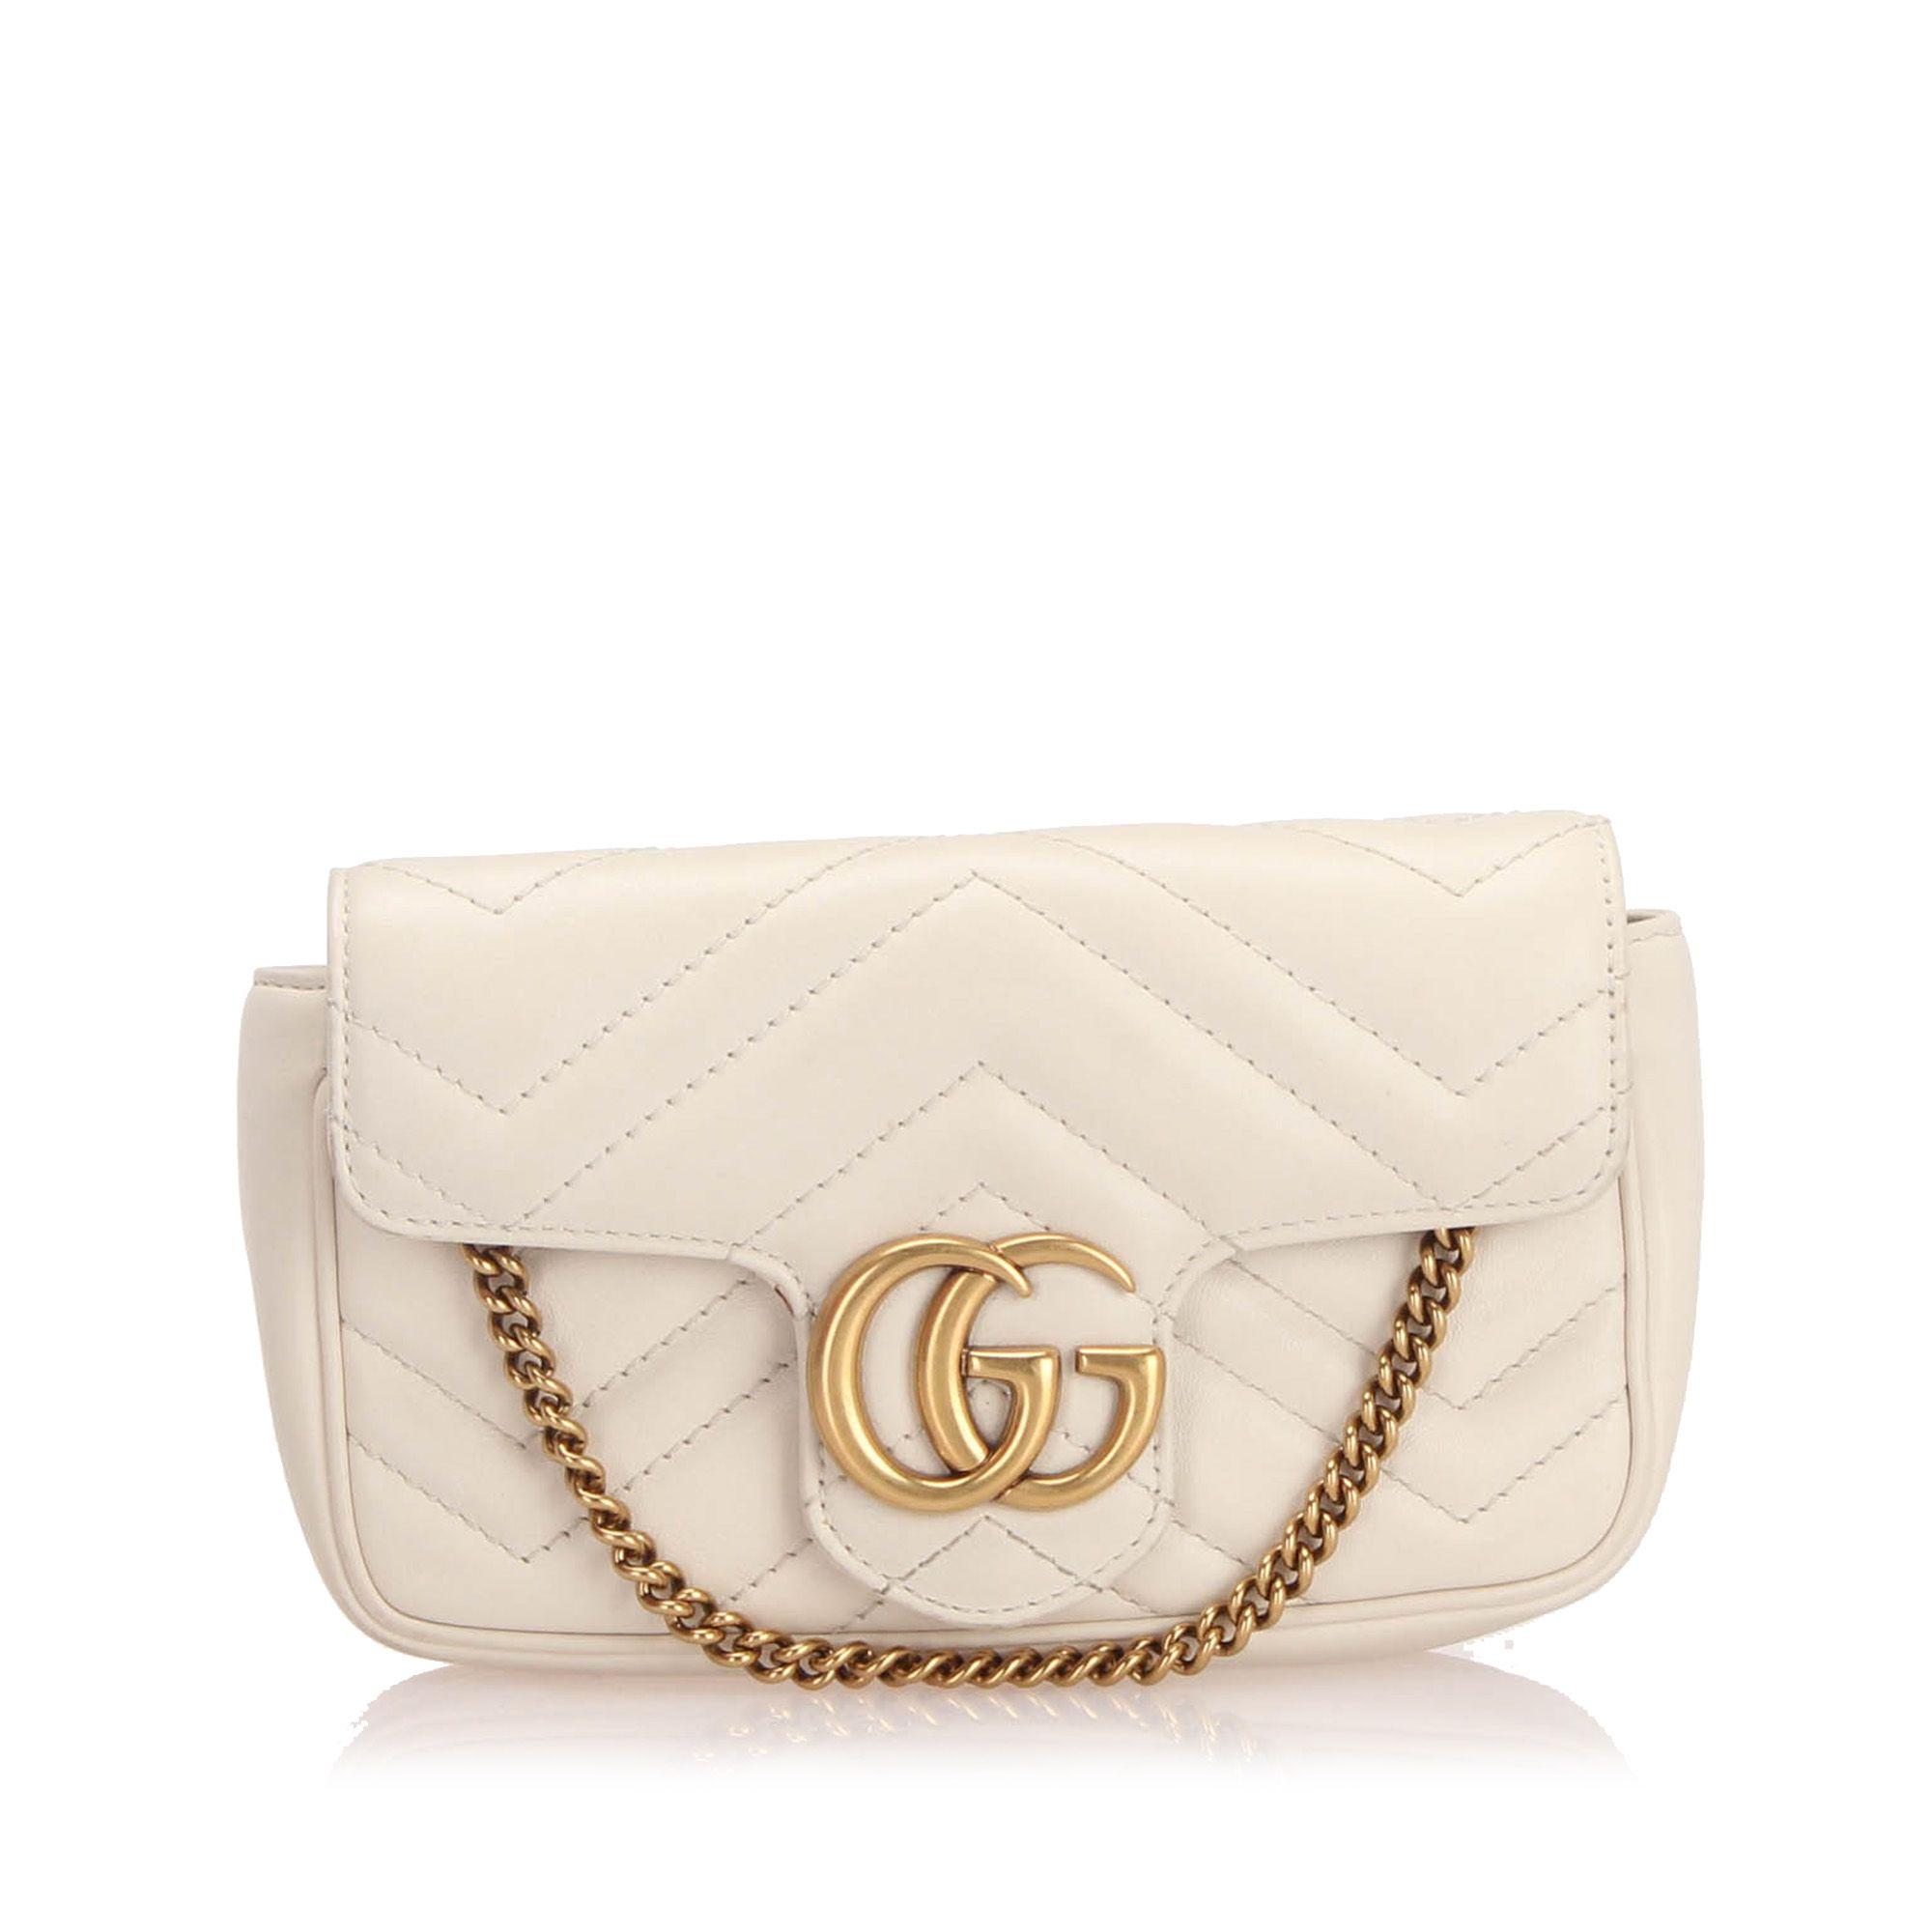 Vintage Gucci Mini GG Marmont Matelasse Leather Crossbody Bag White